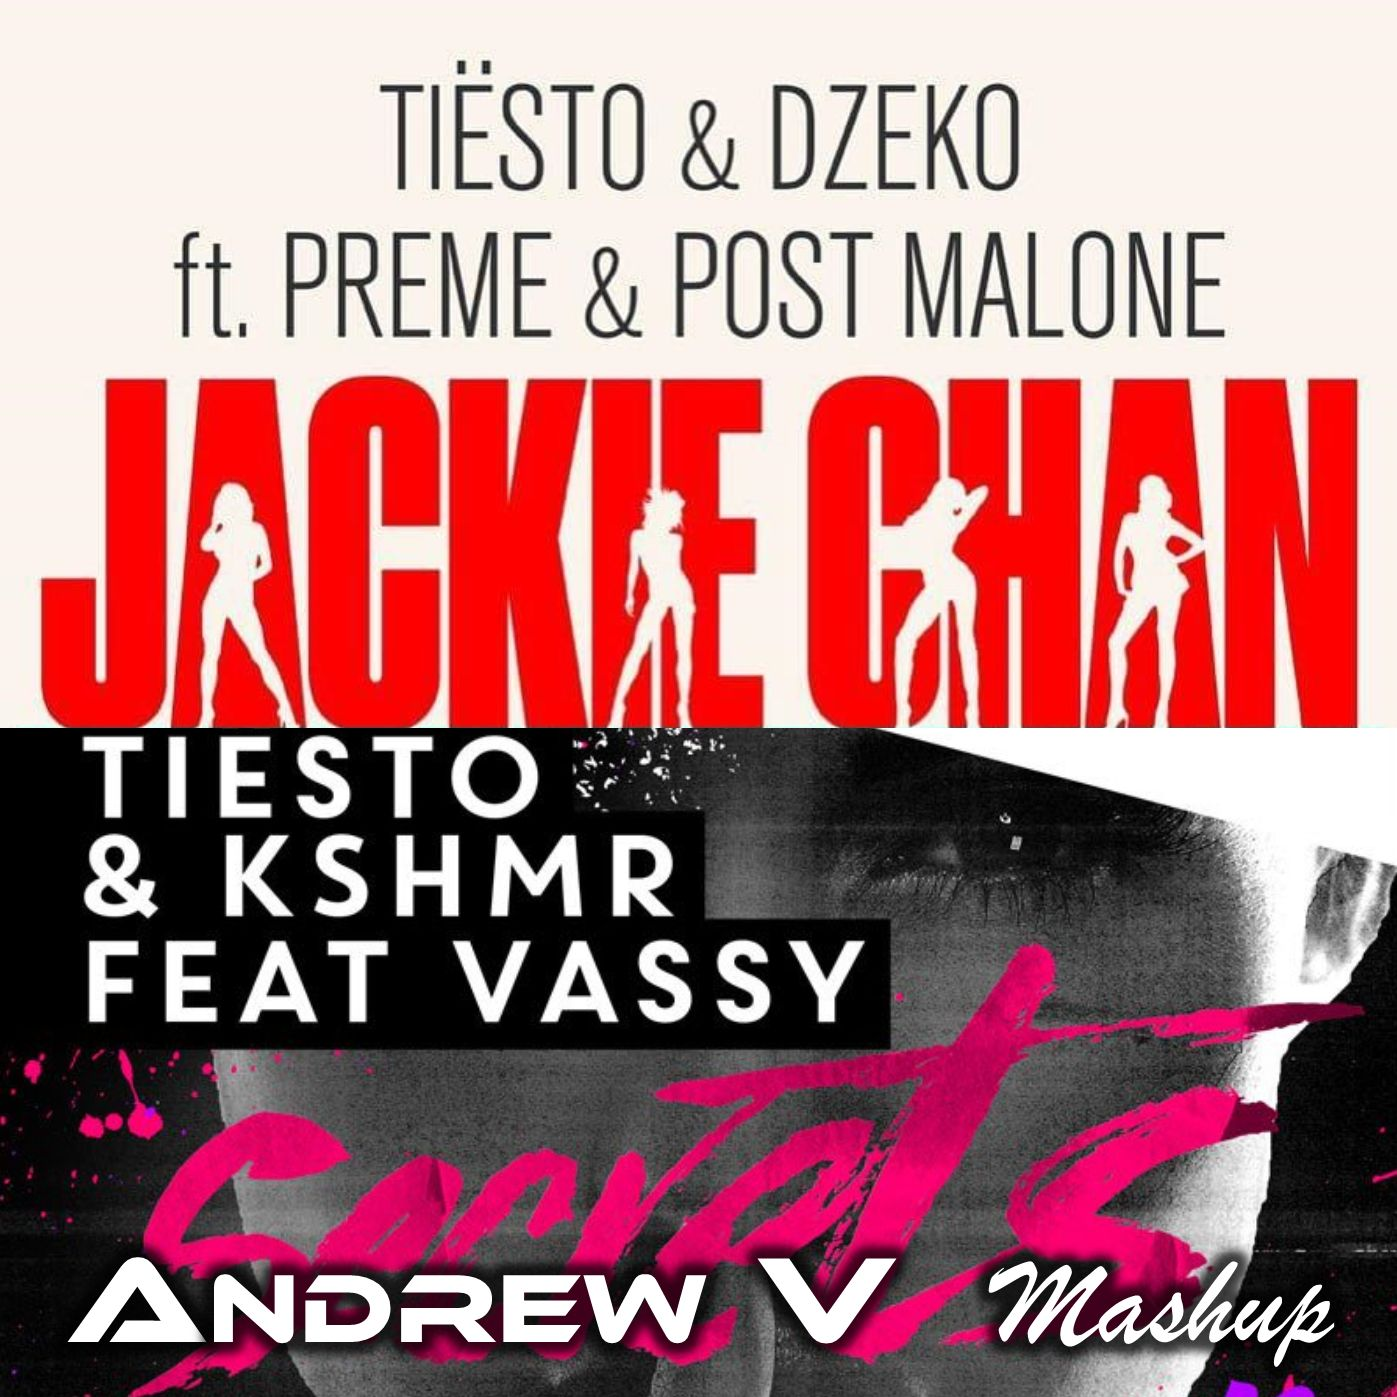 Post Malone Hit This Hard: Jackie Secrets (Andrew V Mashup) By Tiesto Vs Post Malone